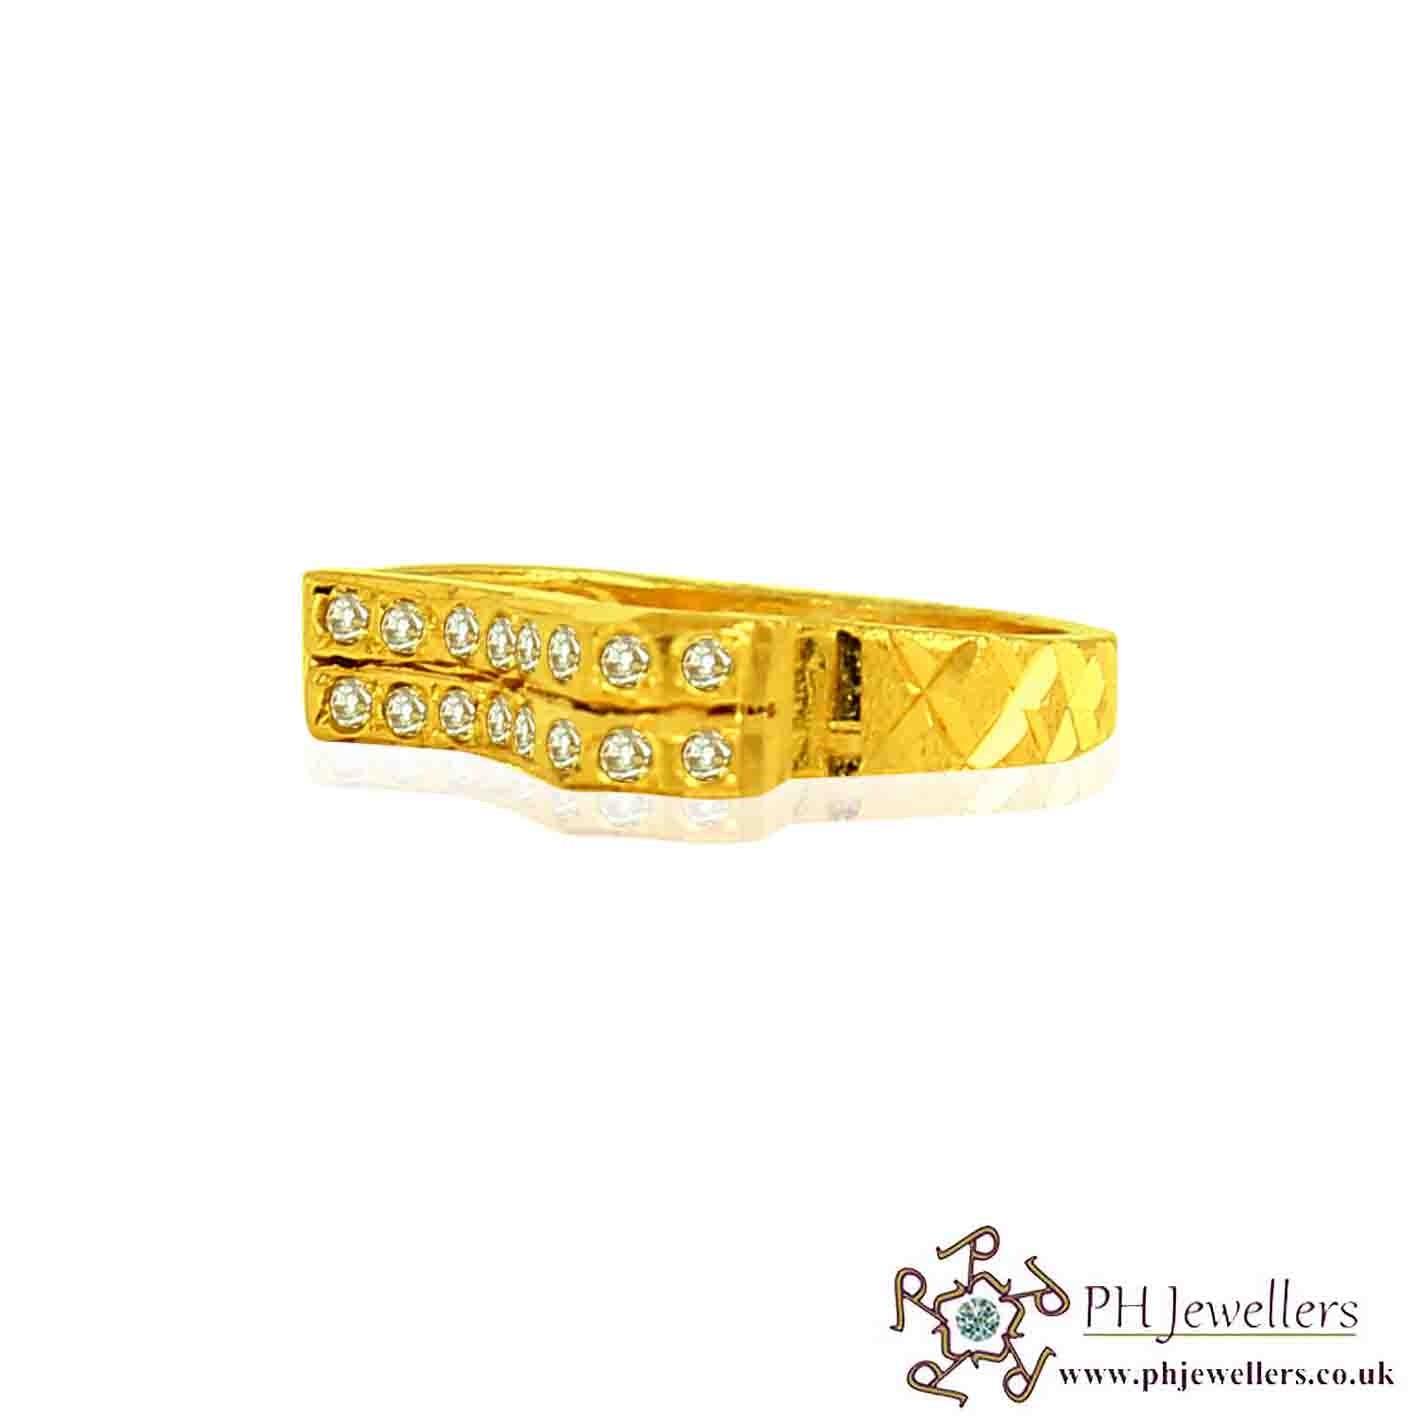 22ct 916 Hallmark Yellow Gold Size J,K,L Ring CZ SR85